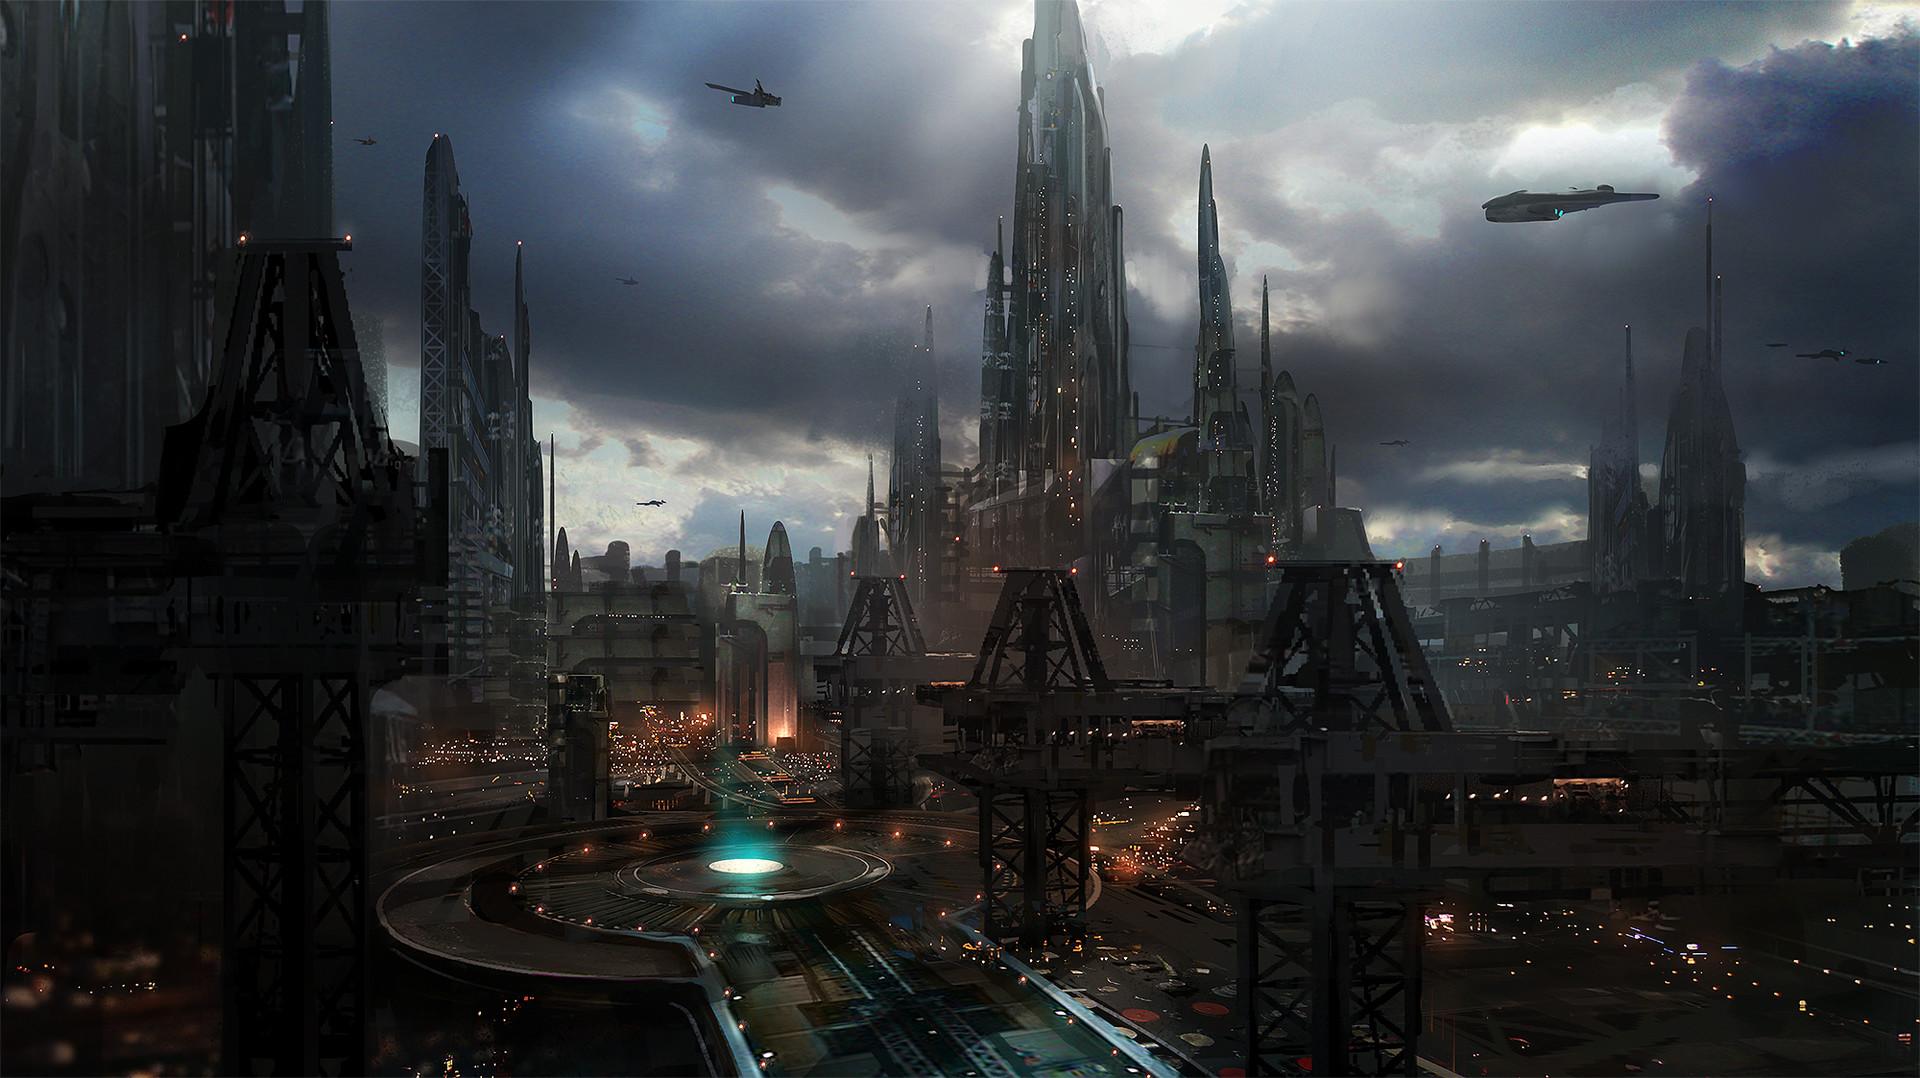 ArtStation - Sci-fi city scape concept art - class demo, James Paick